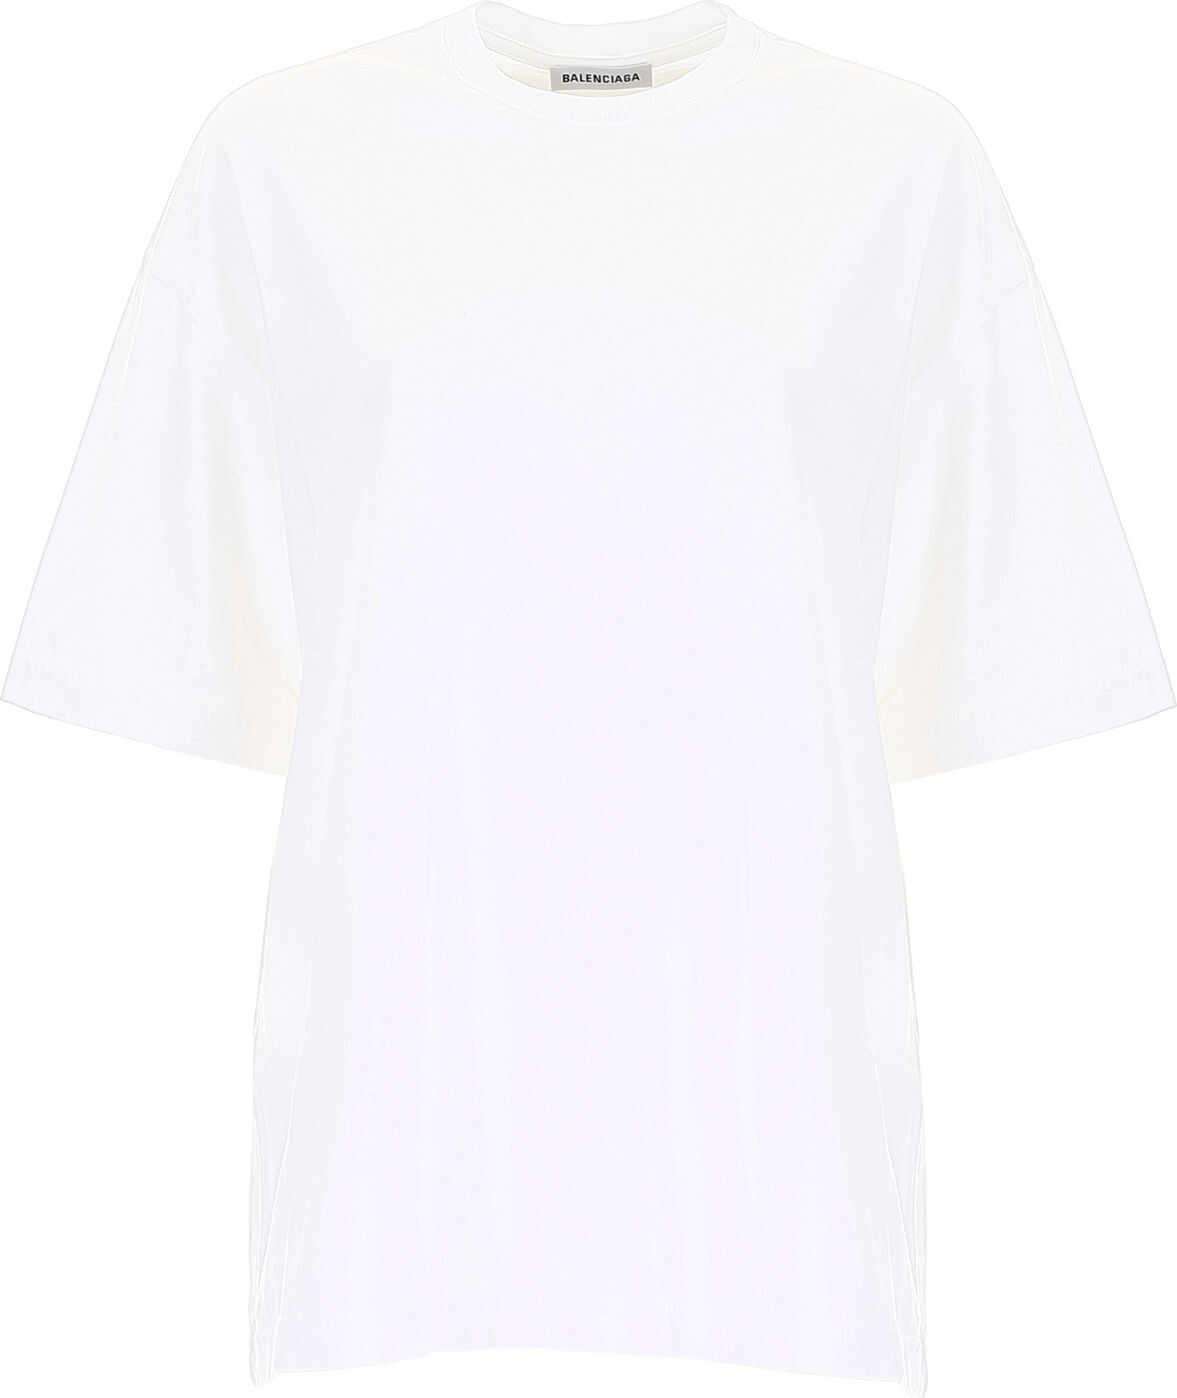 Balenciaga Gothic Logo T-Shirt OFF WHITE